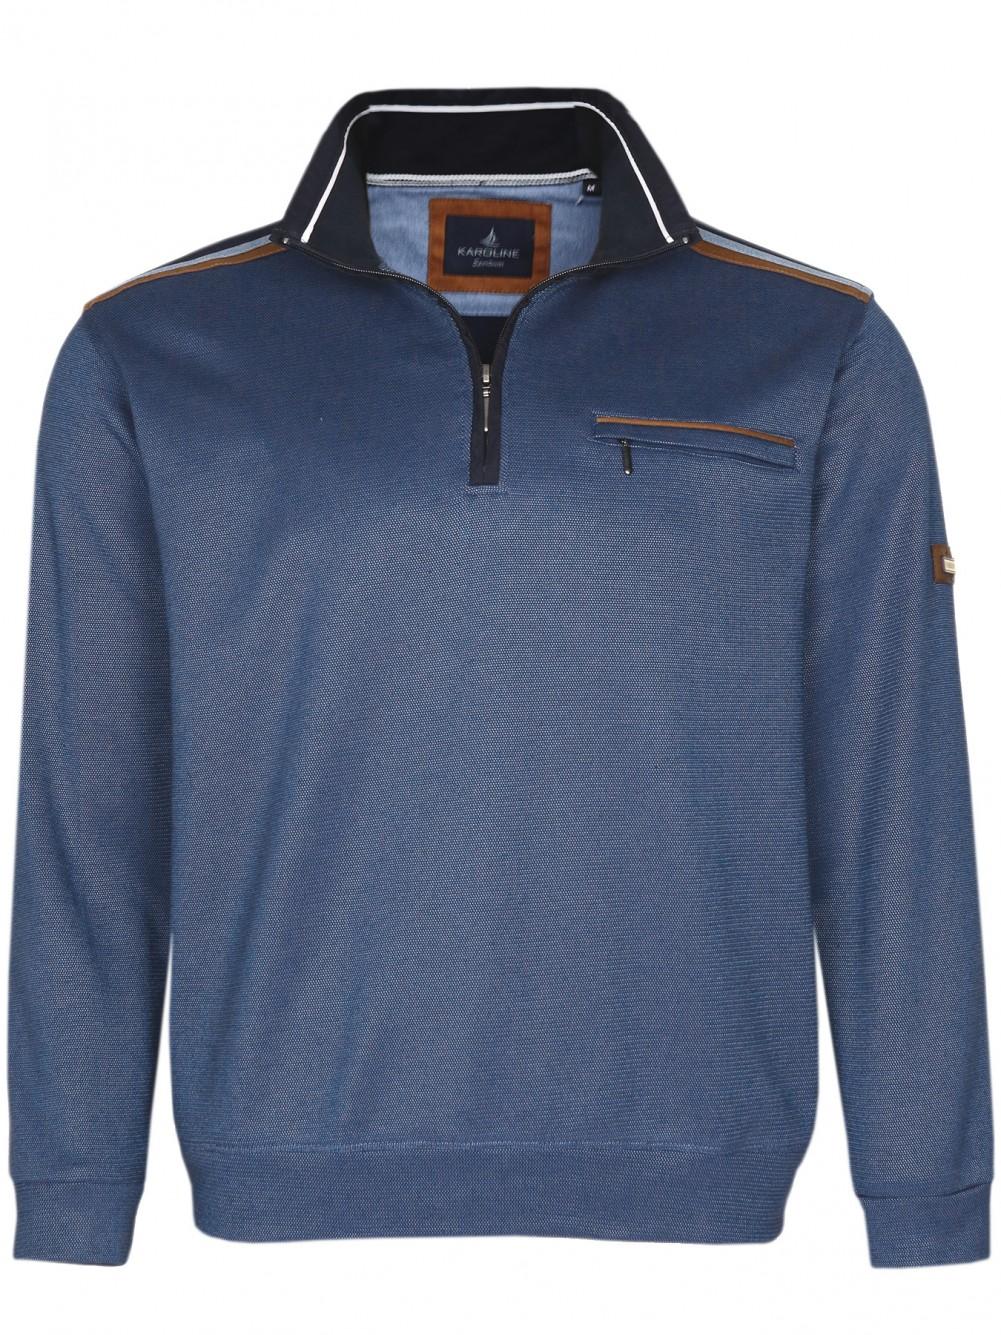 Herren Baumwoll-Piqué Polo-Shirt in Blouson-Form - Dunkelblau